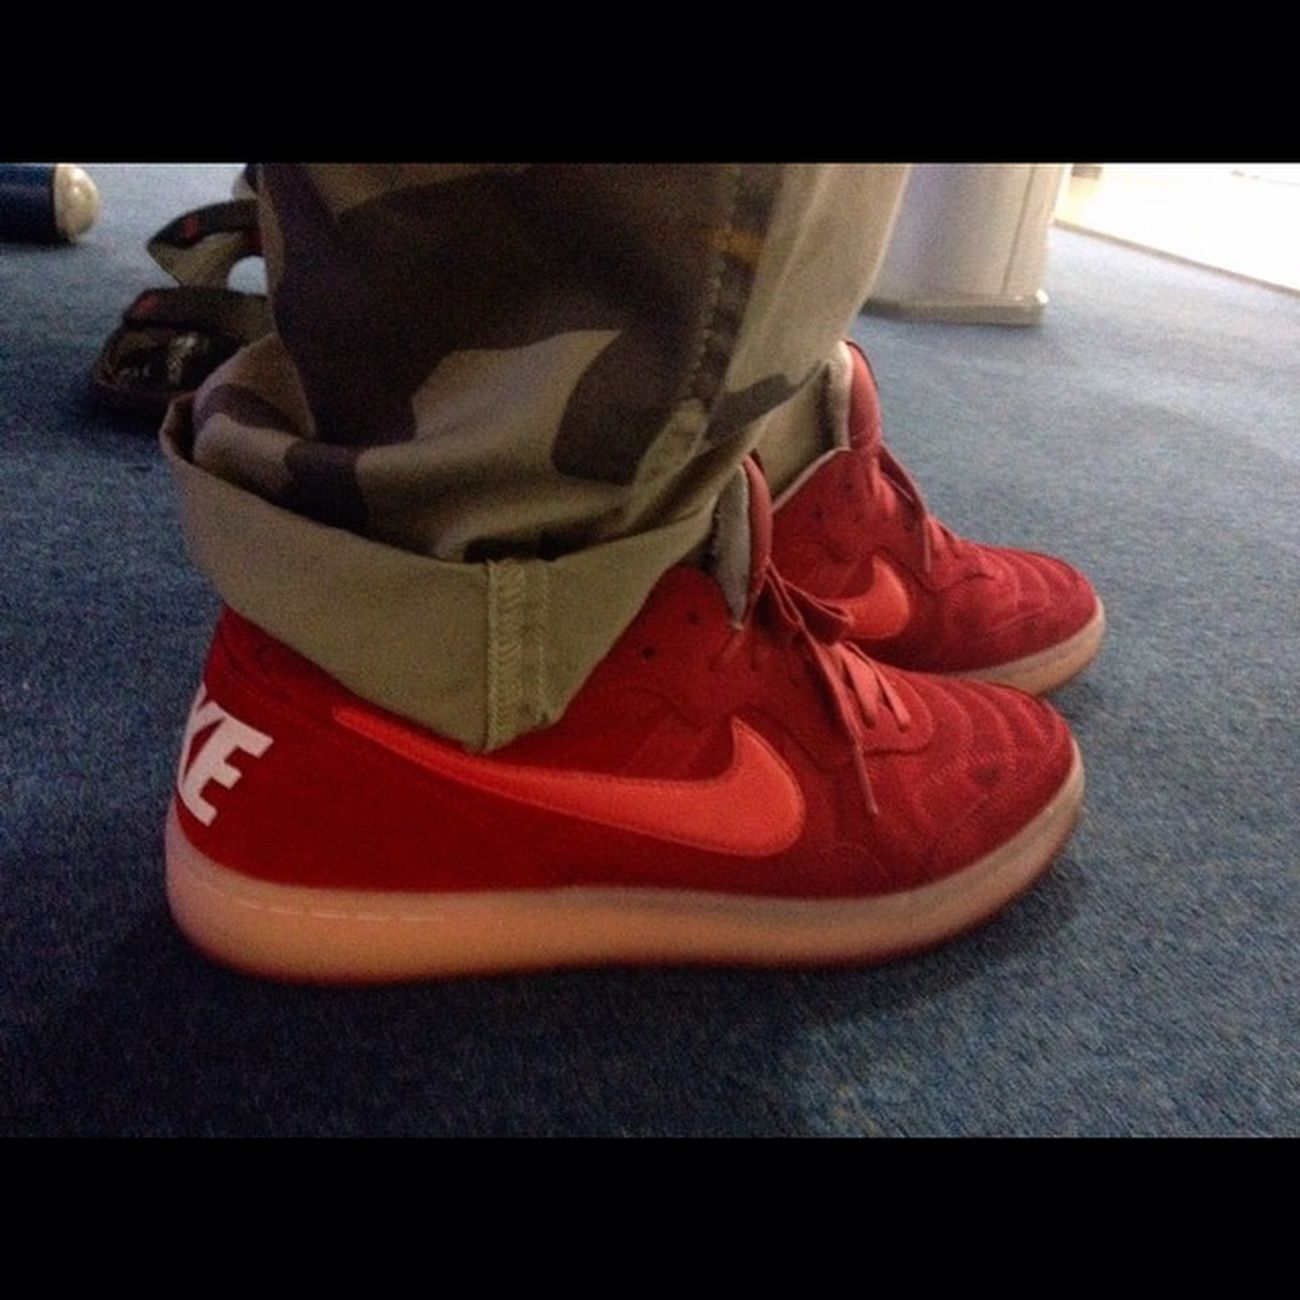 Instasize IPhone Nike Nikesportswear tiempo94 red crimson suede sneakers dockers camo